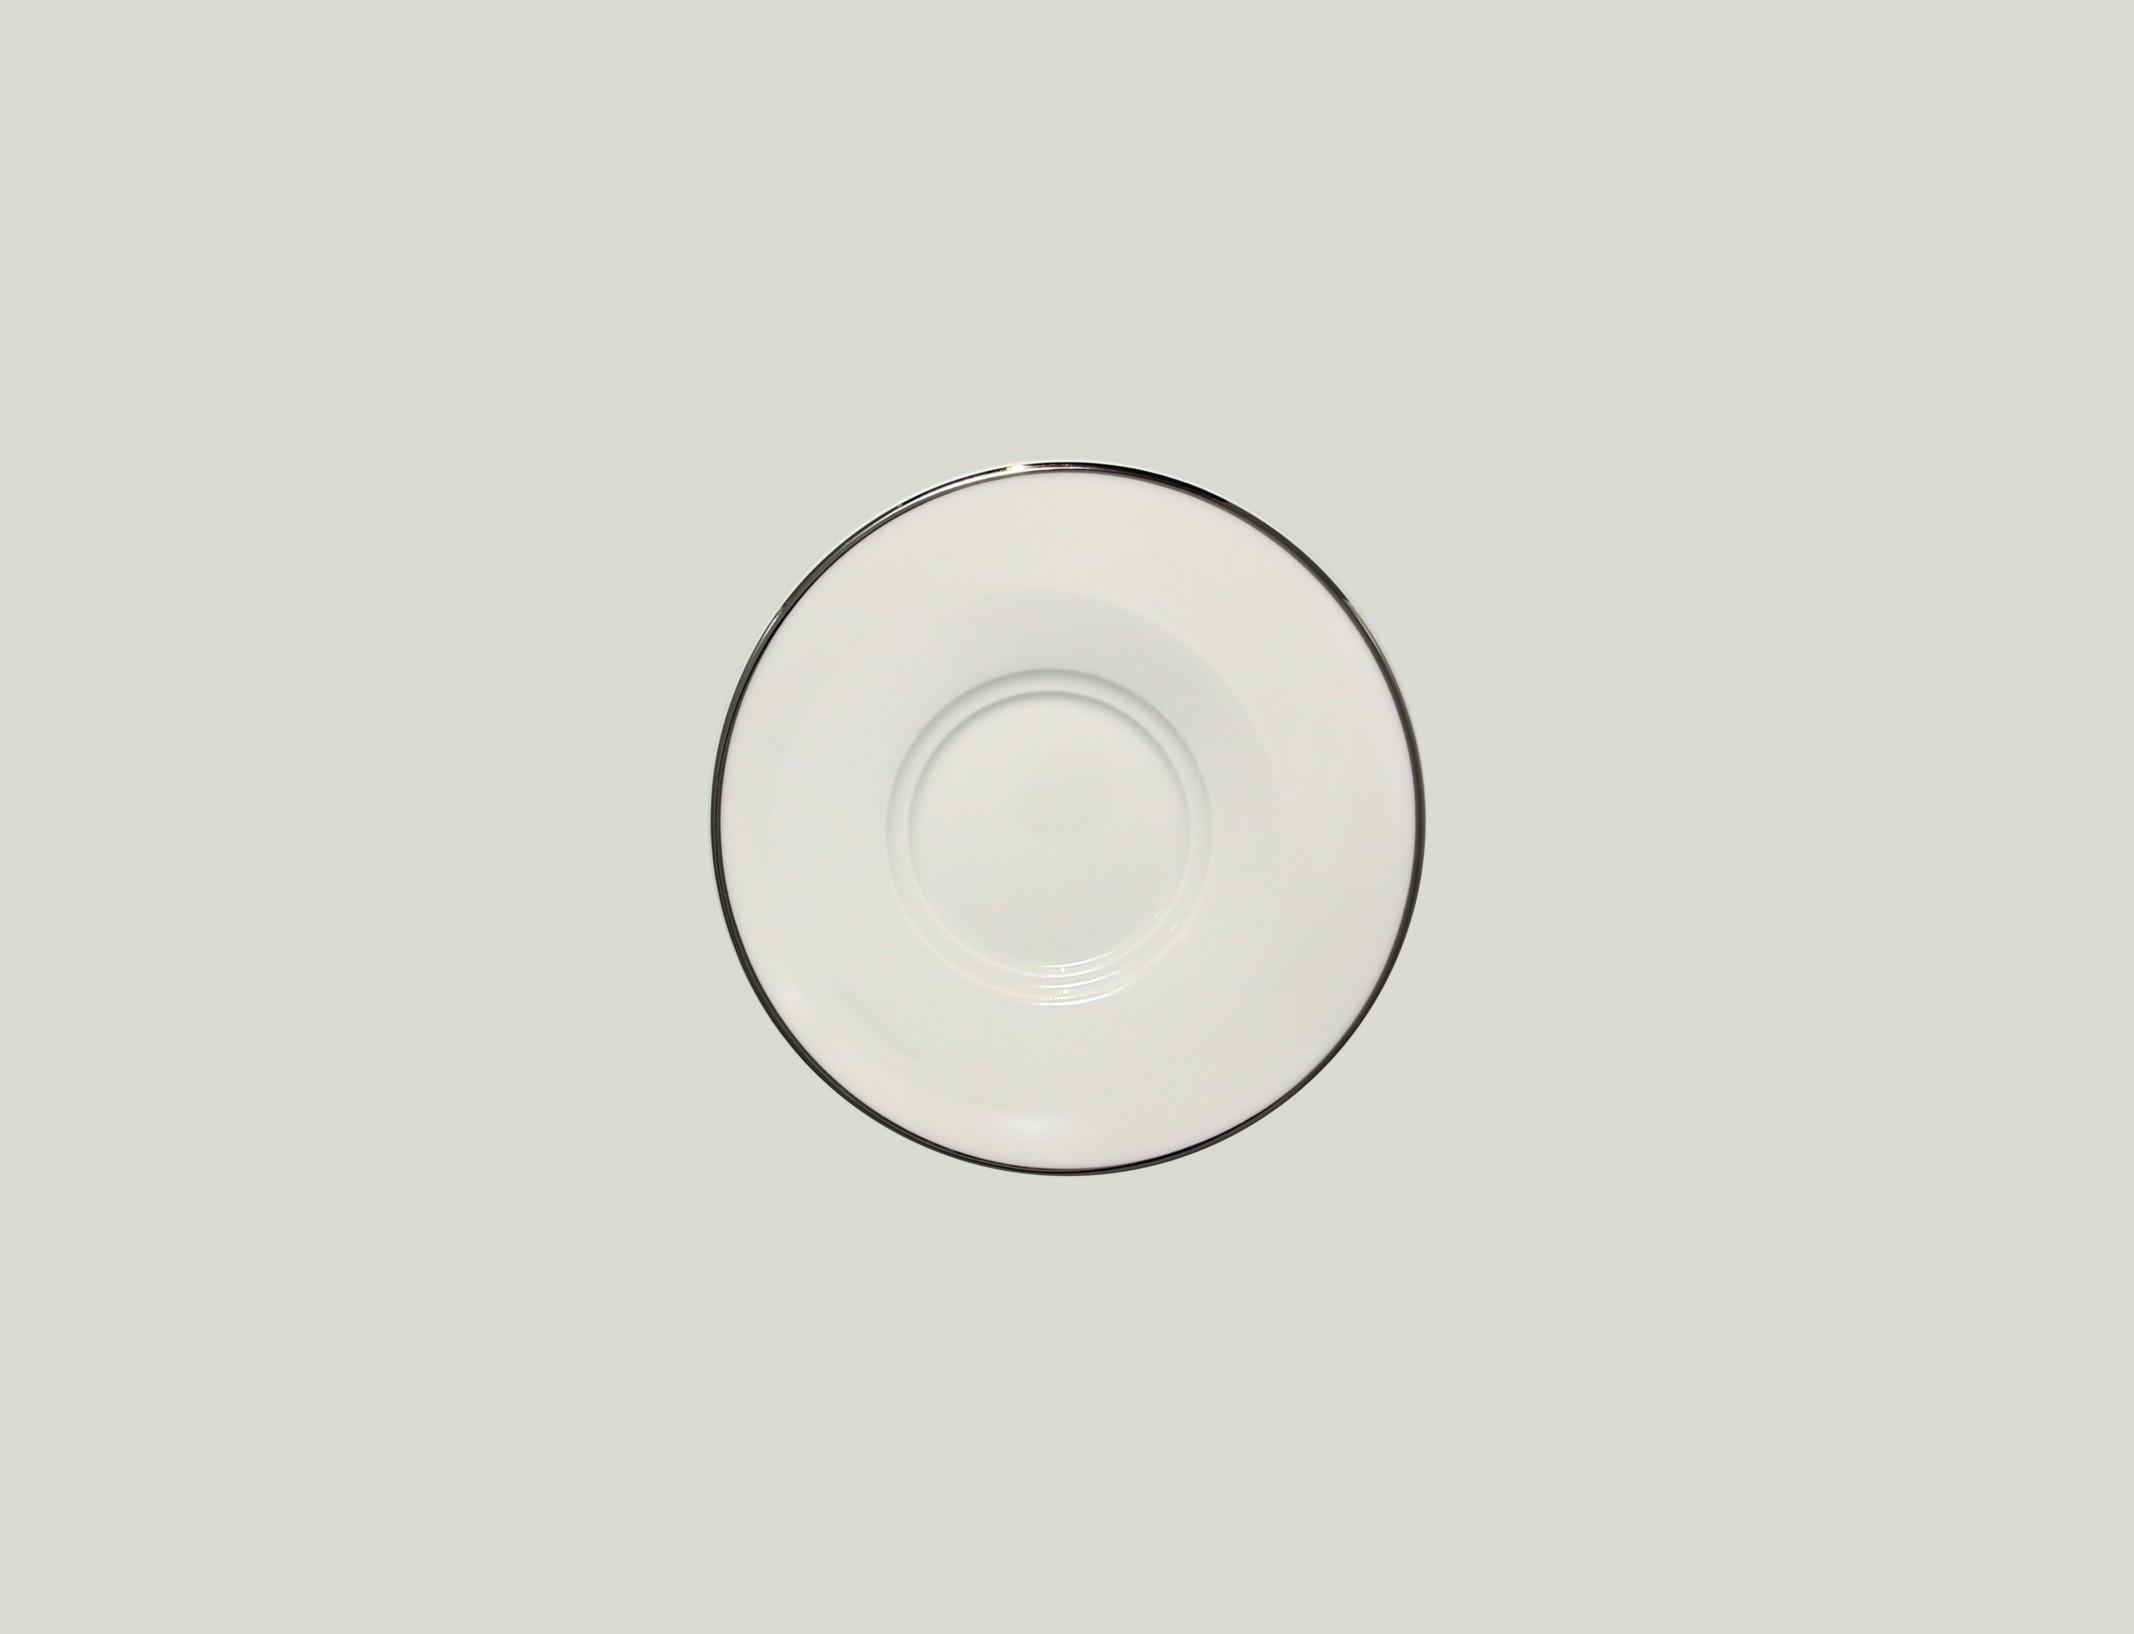 Podšálek pro GICU39/GICU29/GICU23 - S PLATINOVOU LINII PLATINUM